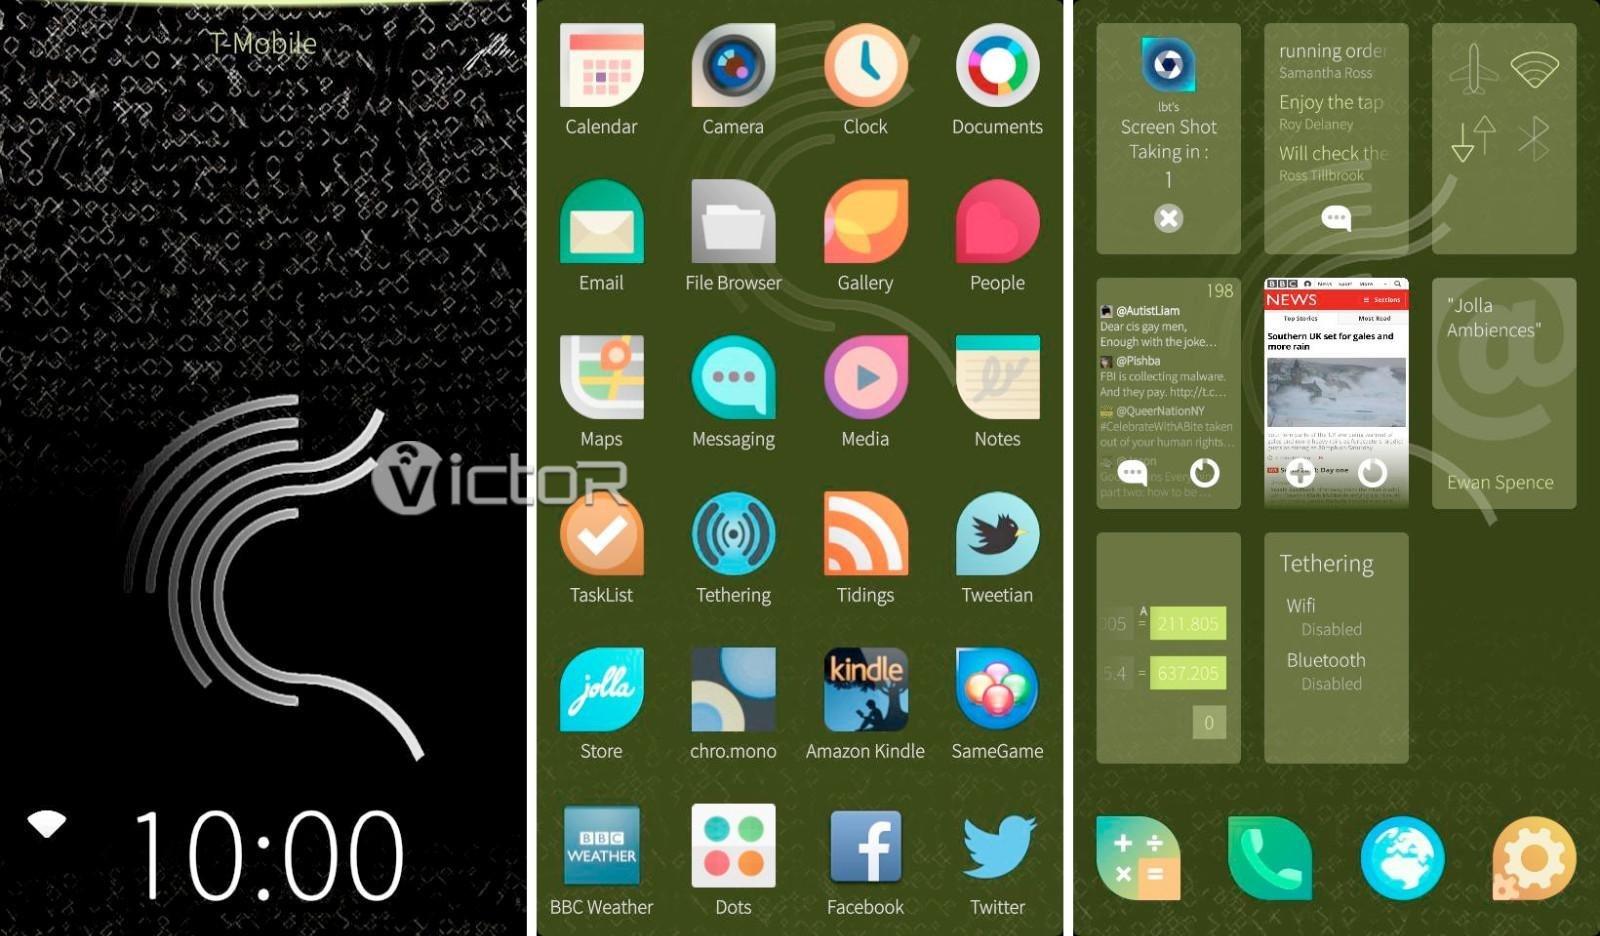 sailfish OS - sailfish operating system - phone operating systems - 1